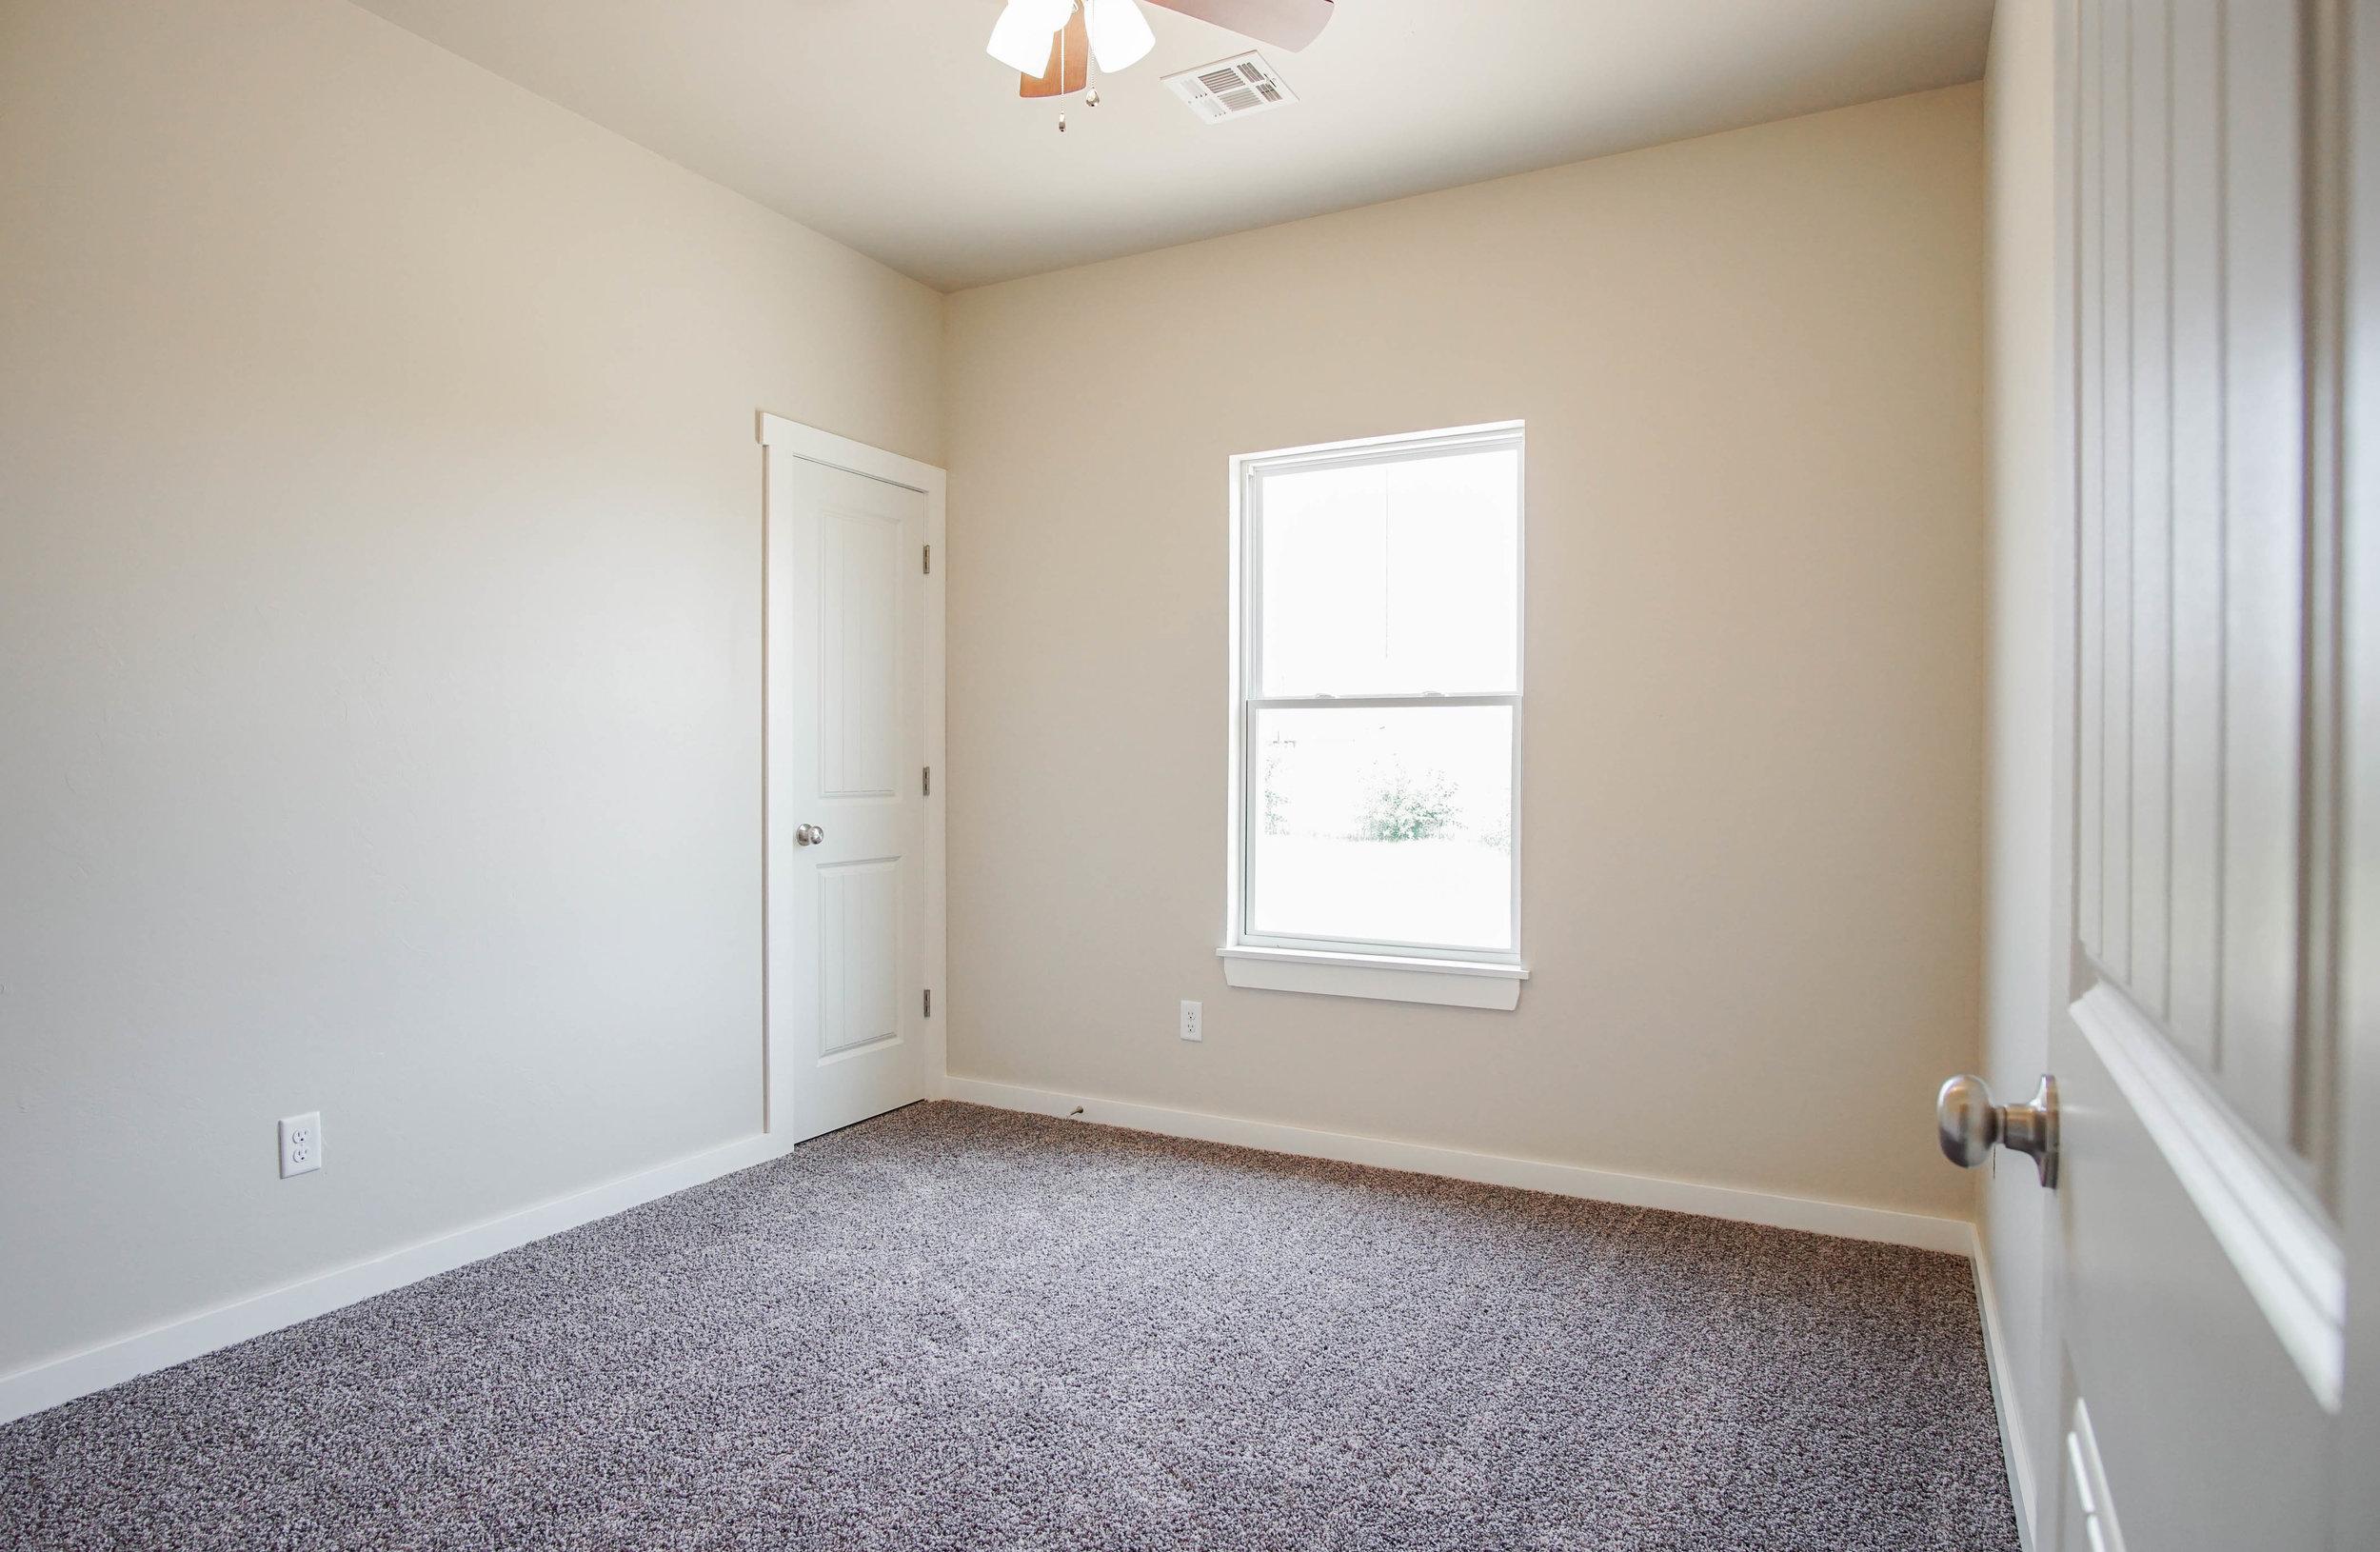 50 Bedroom 3.jpg